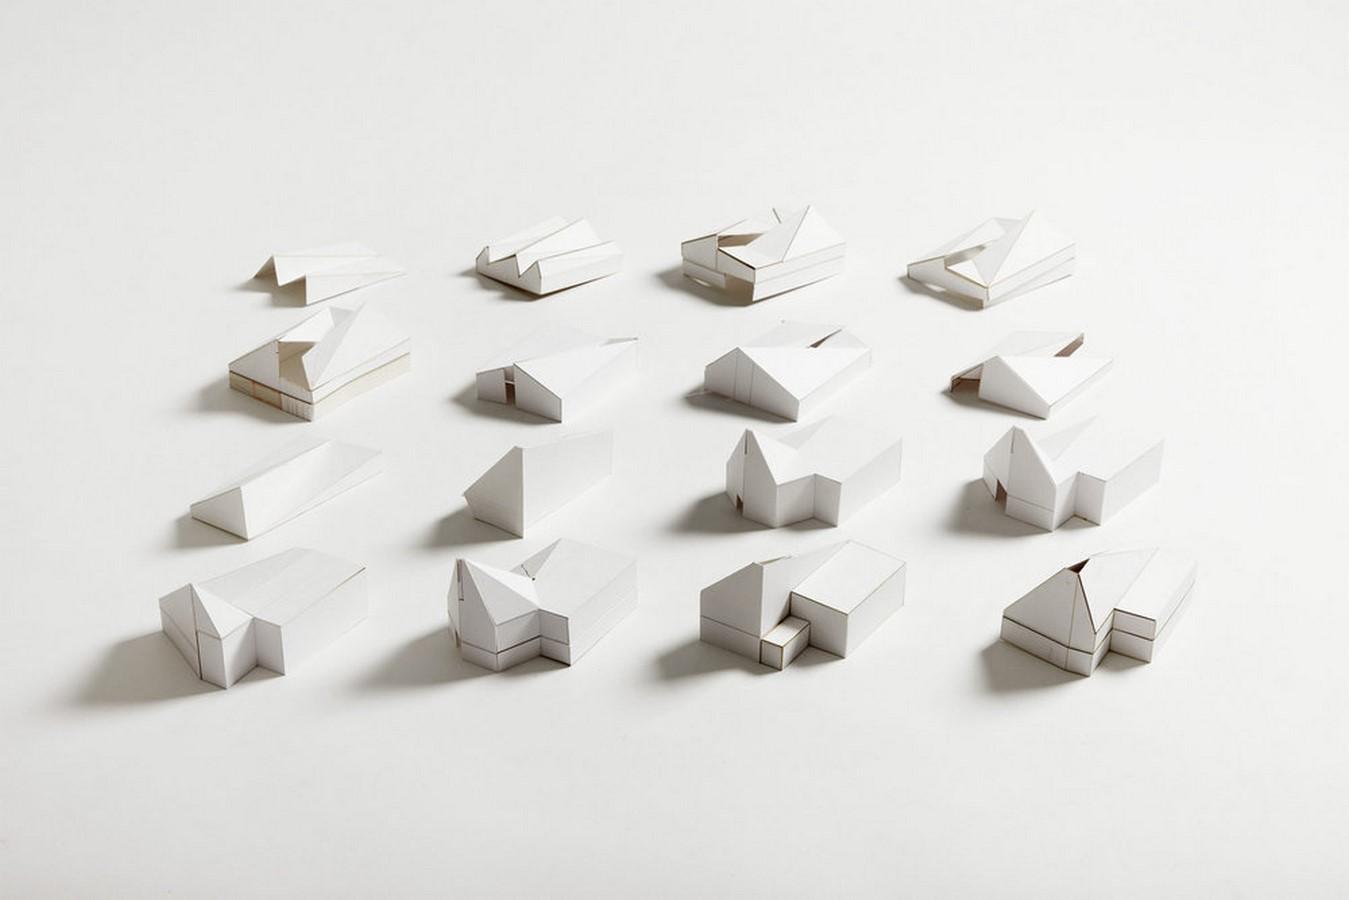 Architecture, an art of skills - Sheet2